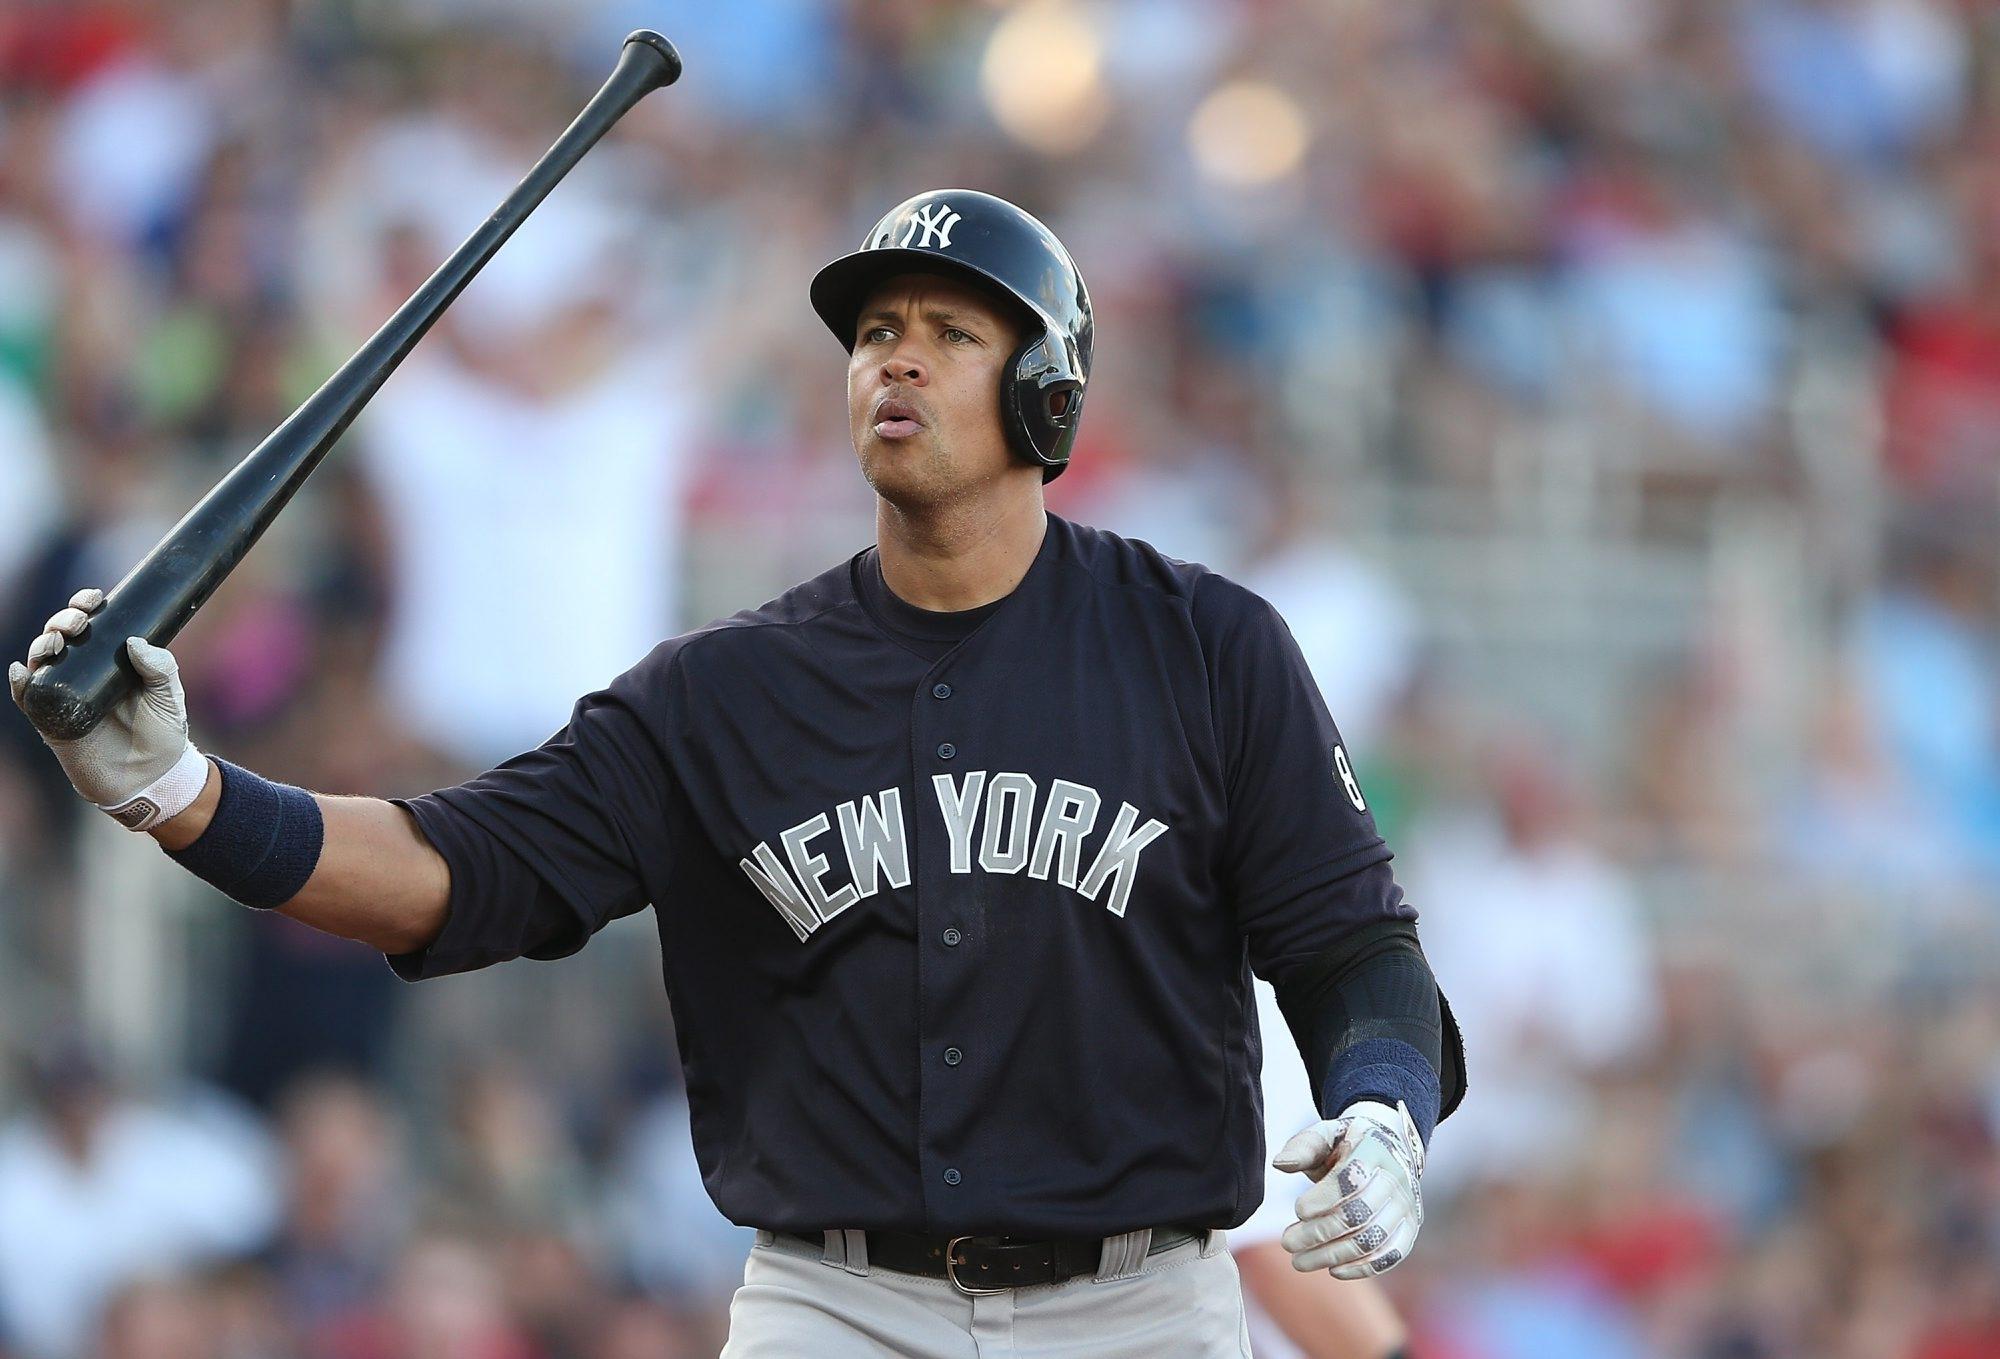 Alex Rodriguez won't be a New York Yankee much longer.